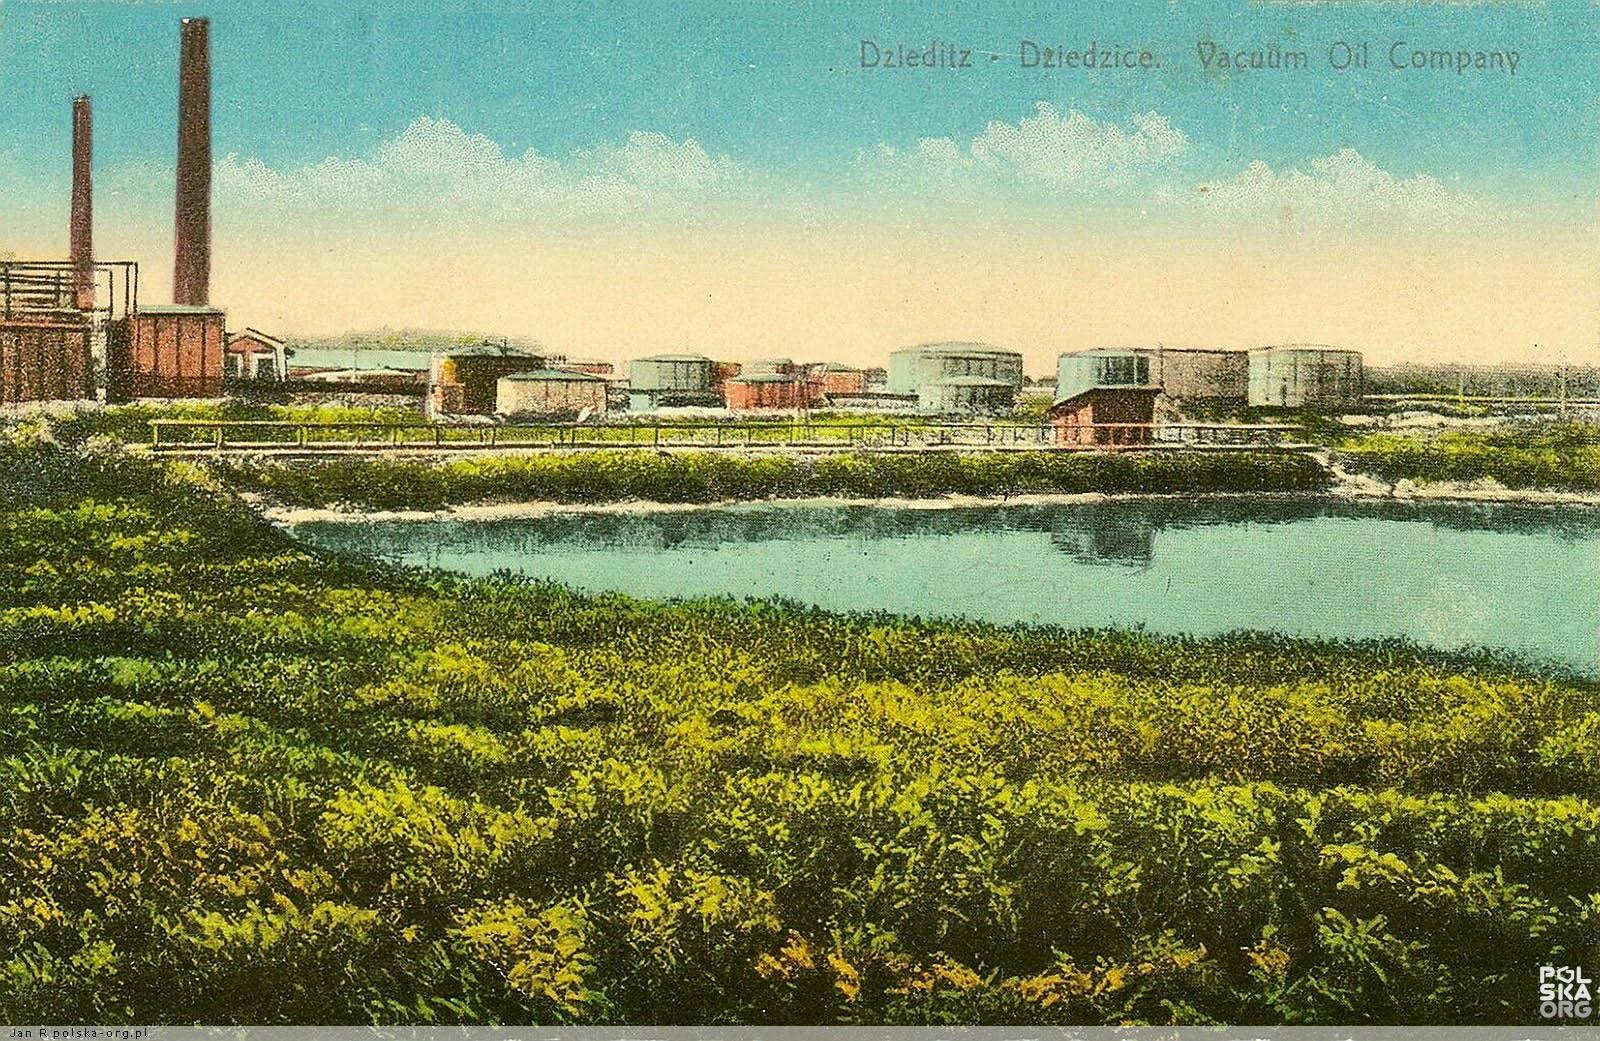 Postcard of Vaccum Oil Company 2